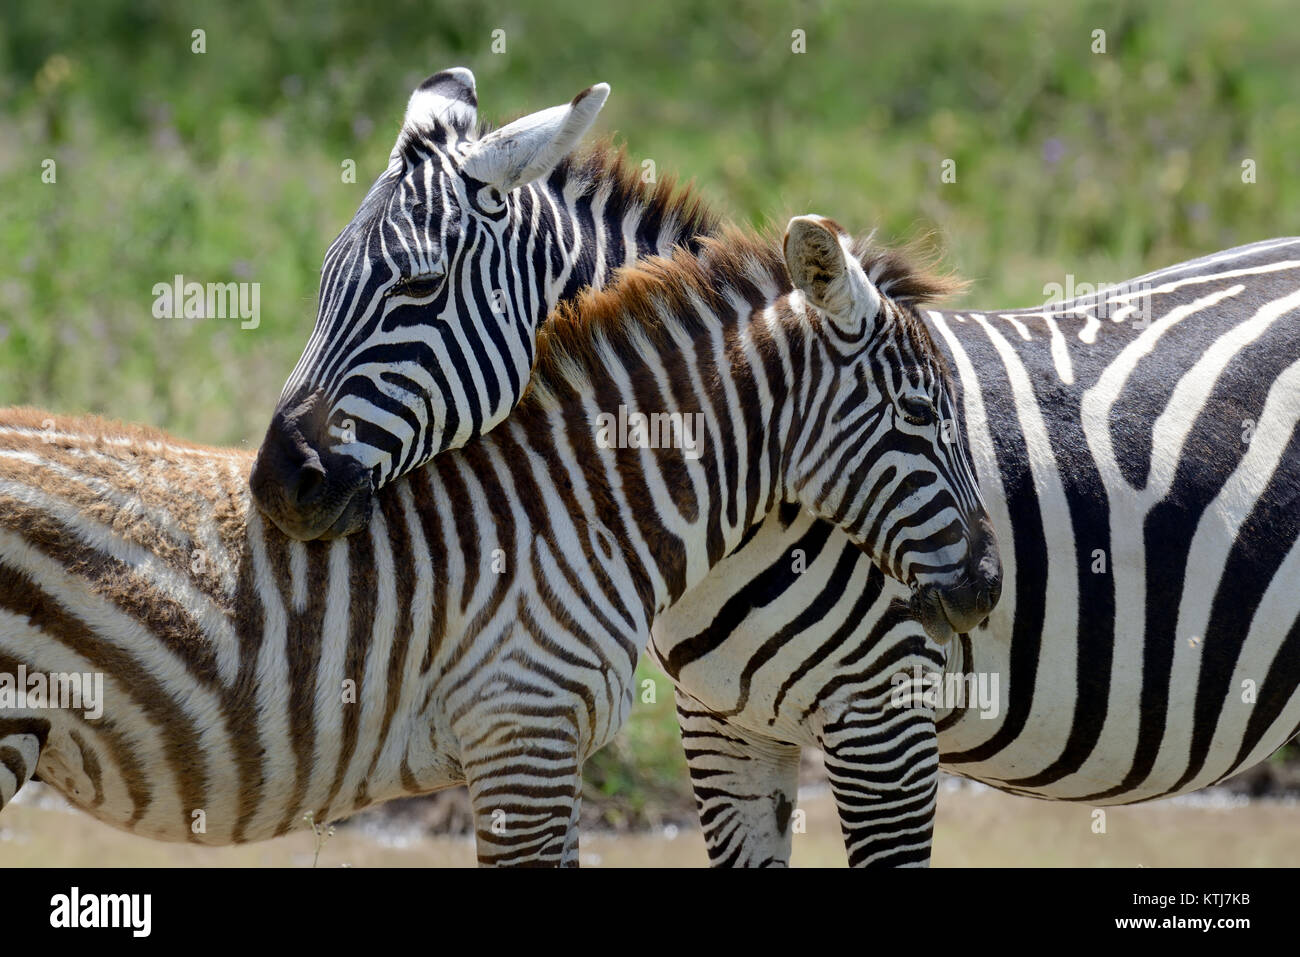 Zebra on grassland in National park of Africa - Stock Image